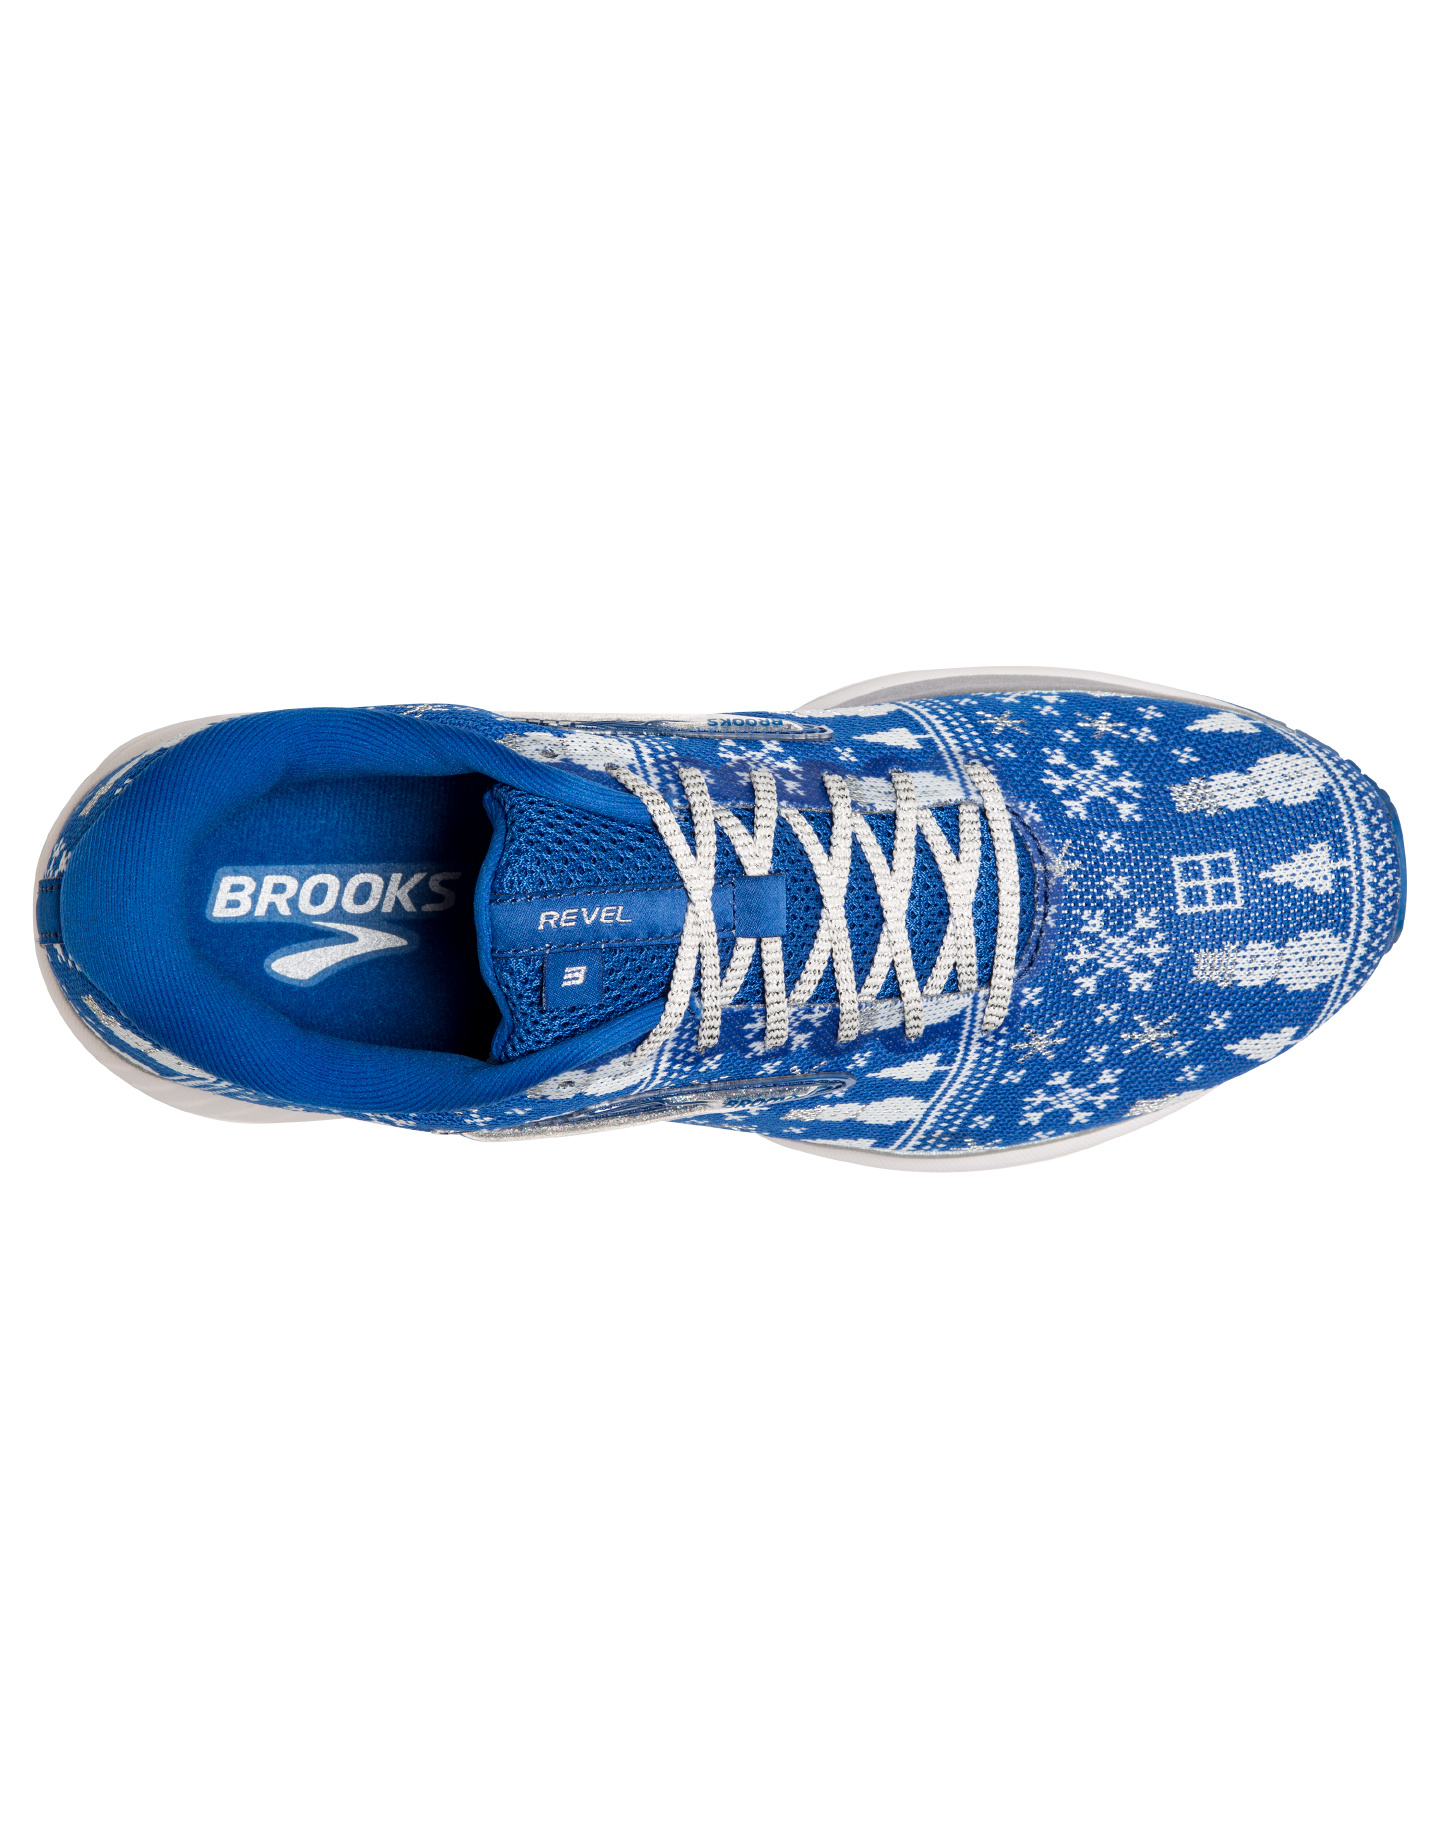 Brooks Brooks Revel 3 Run Merry Edition - Men